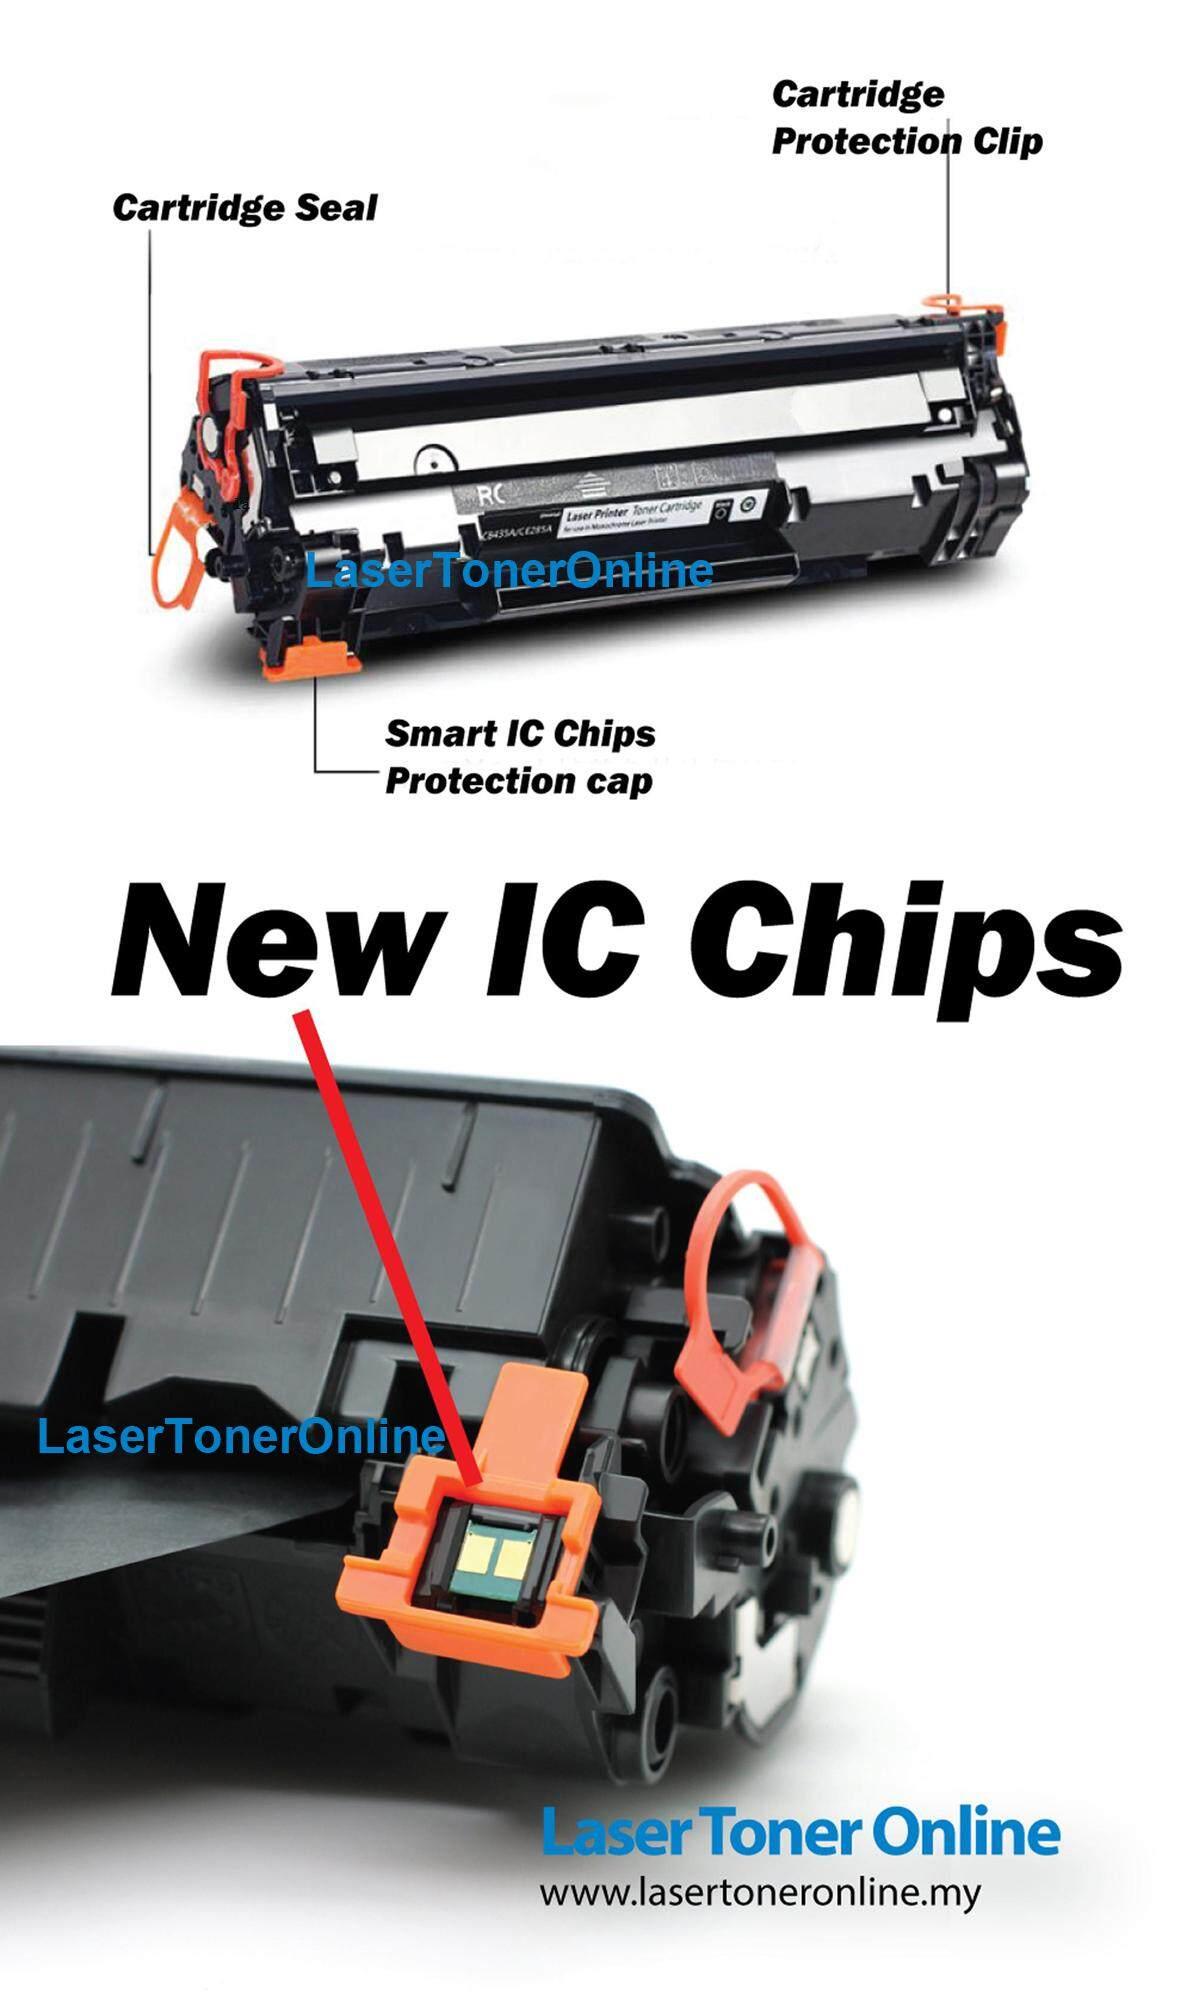 2 Units Fuji Xerox P355 / P355d / P355db / M355 / M355df Printer CT201938  High Yield Compatible Laser Toner Cartridge